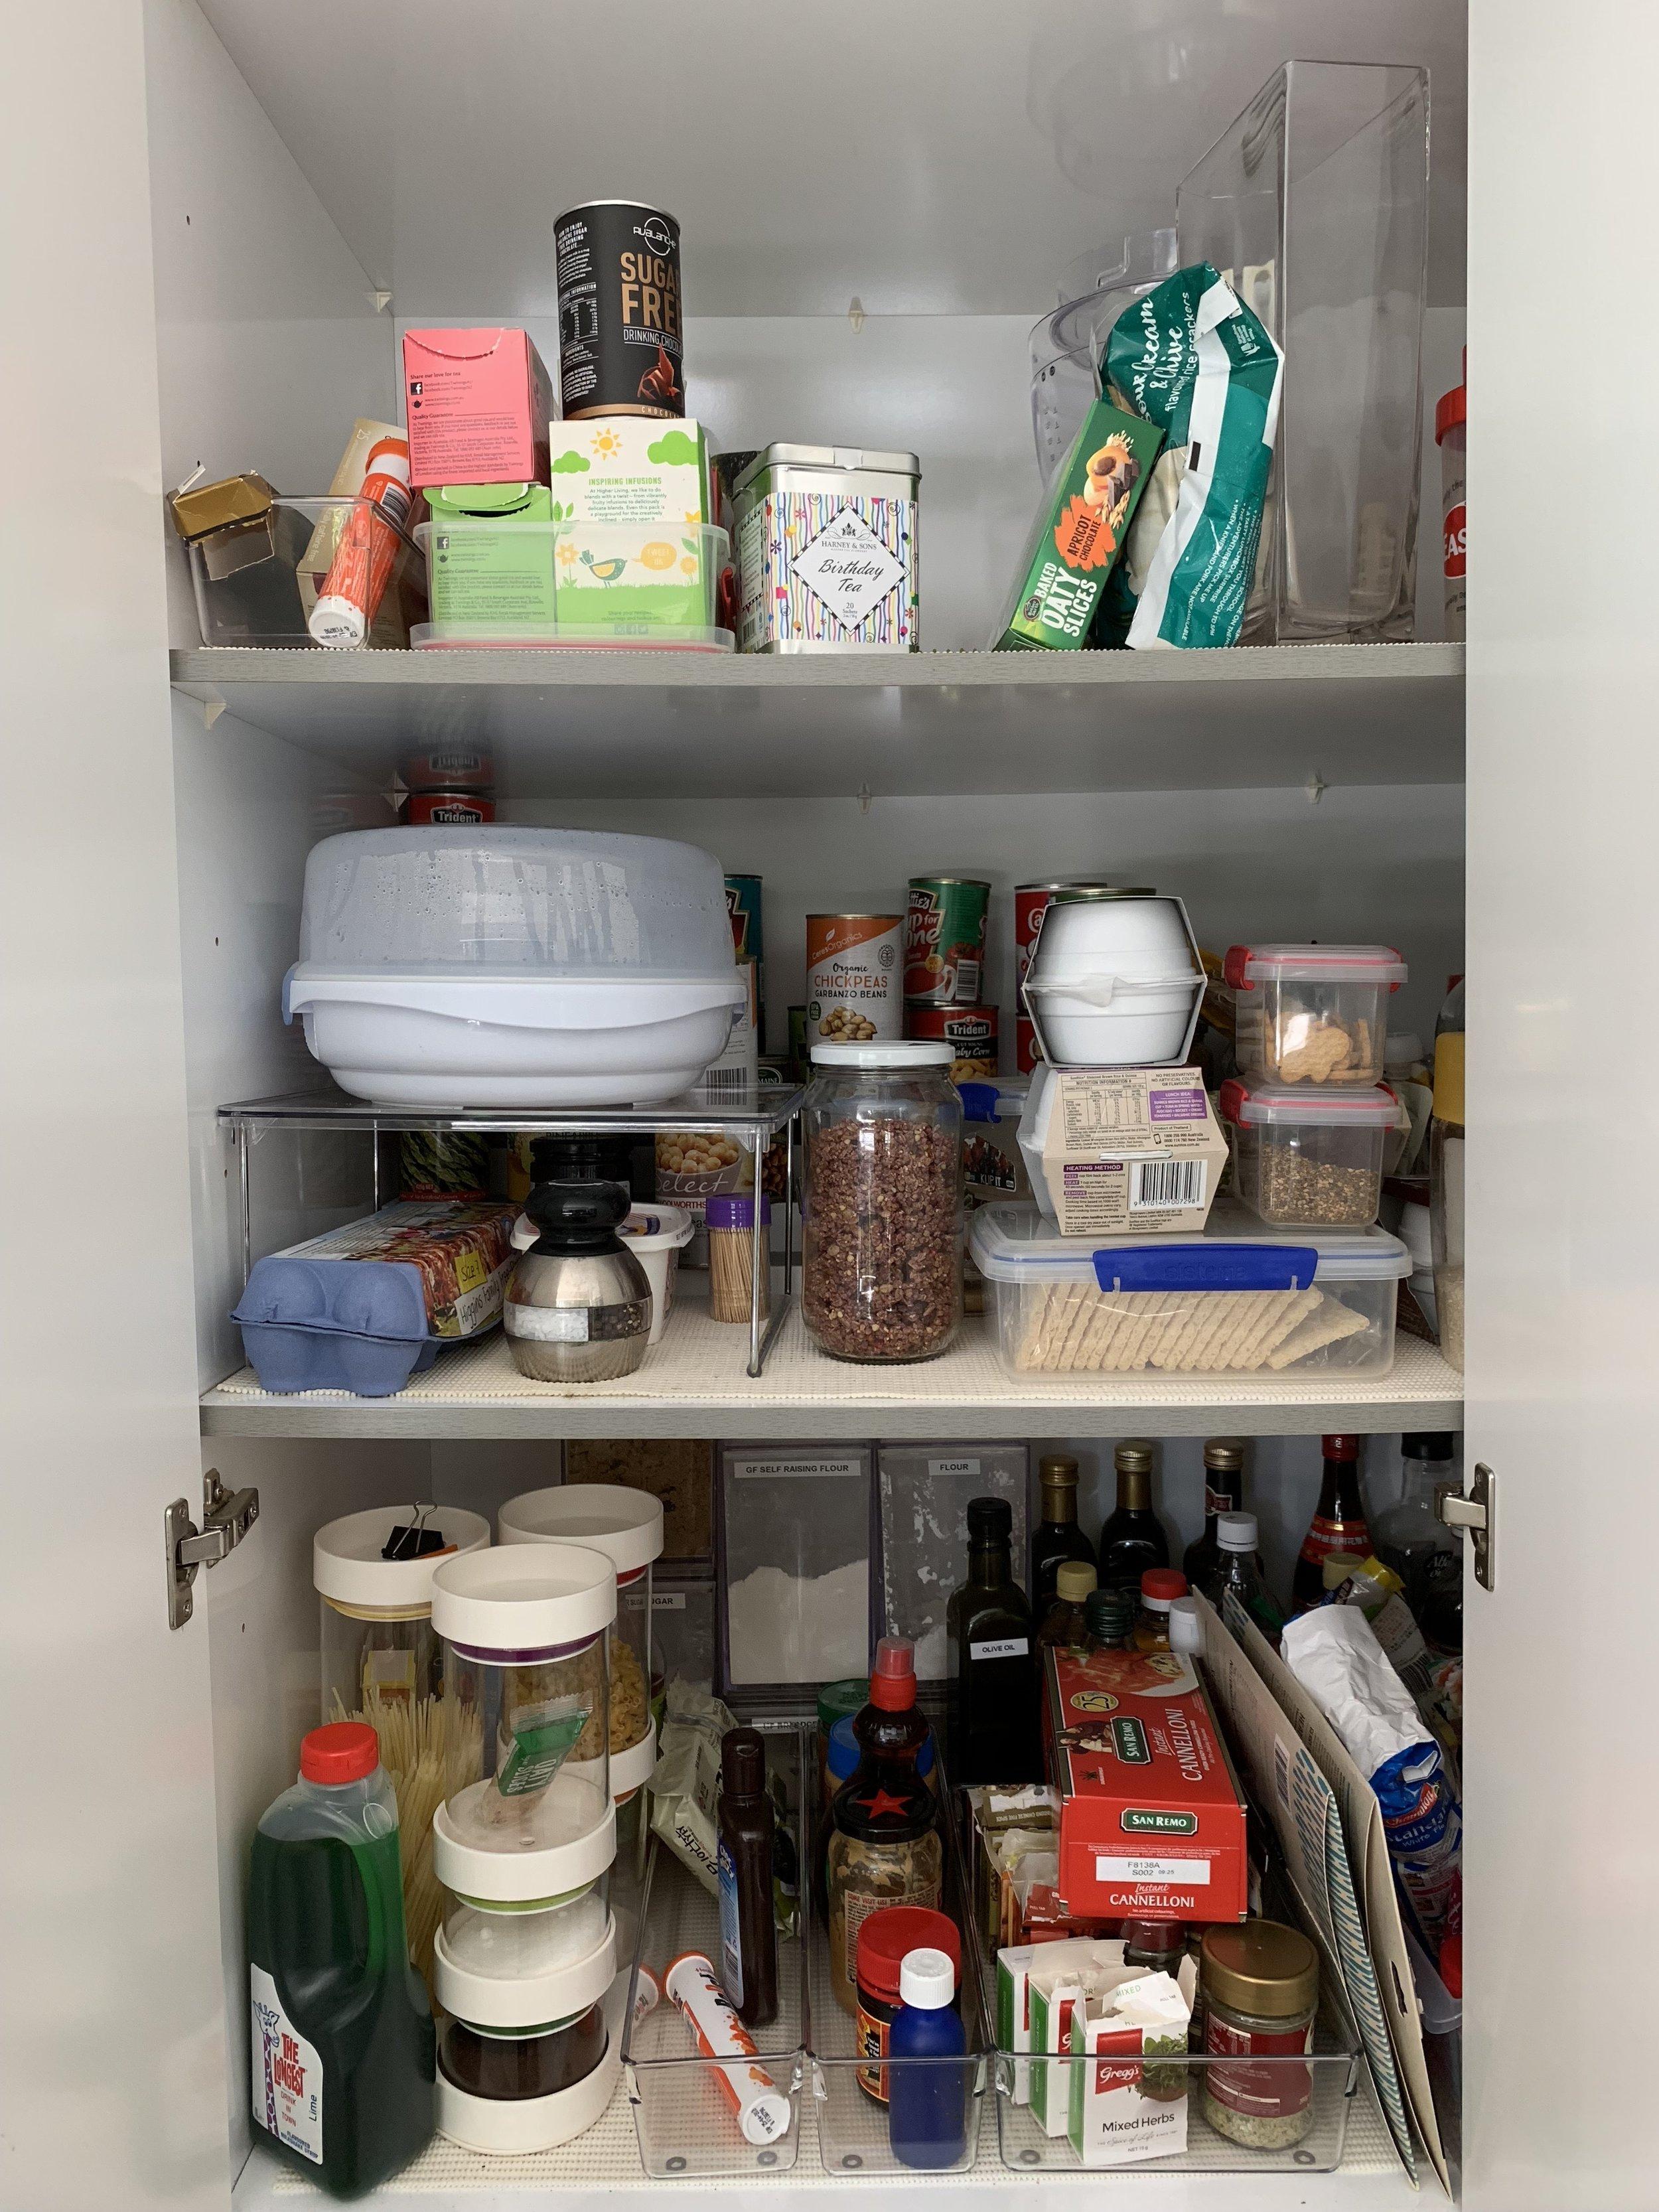 Pantry before - the three main shelves